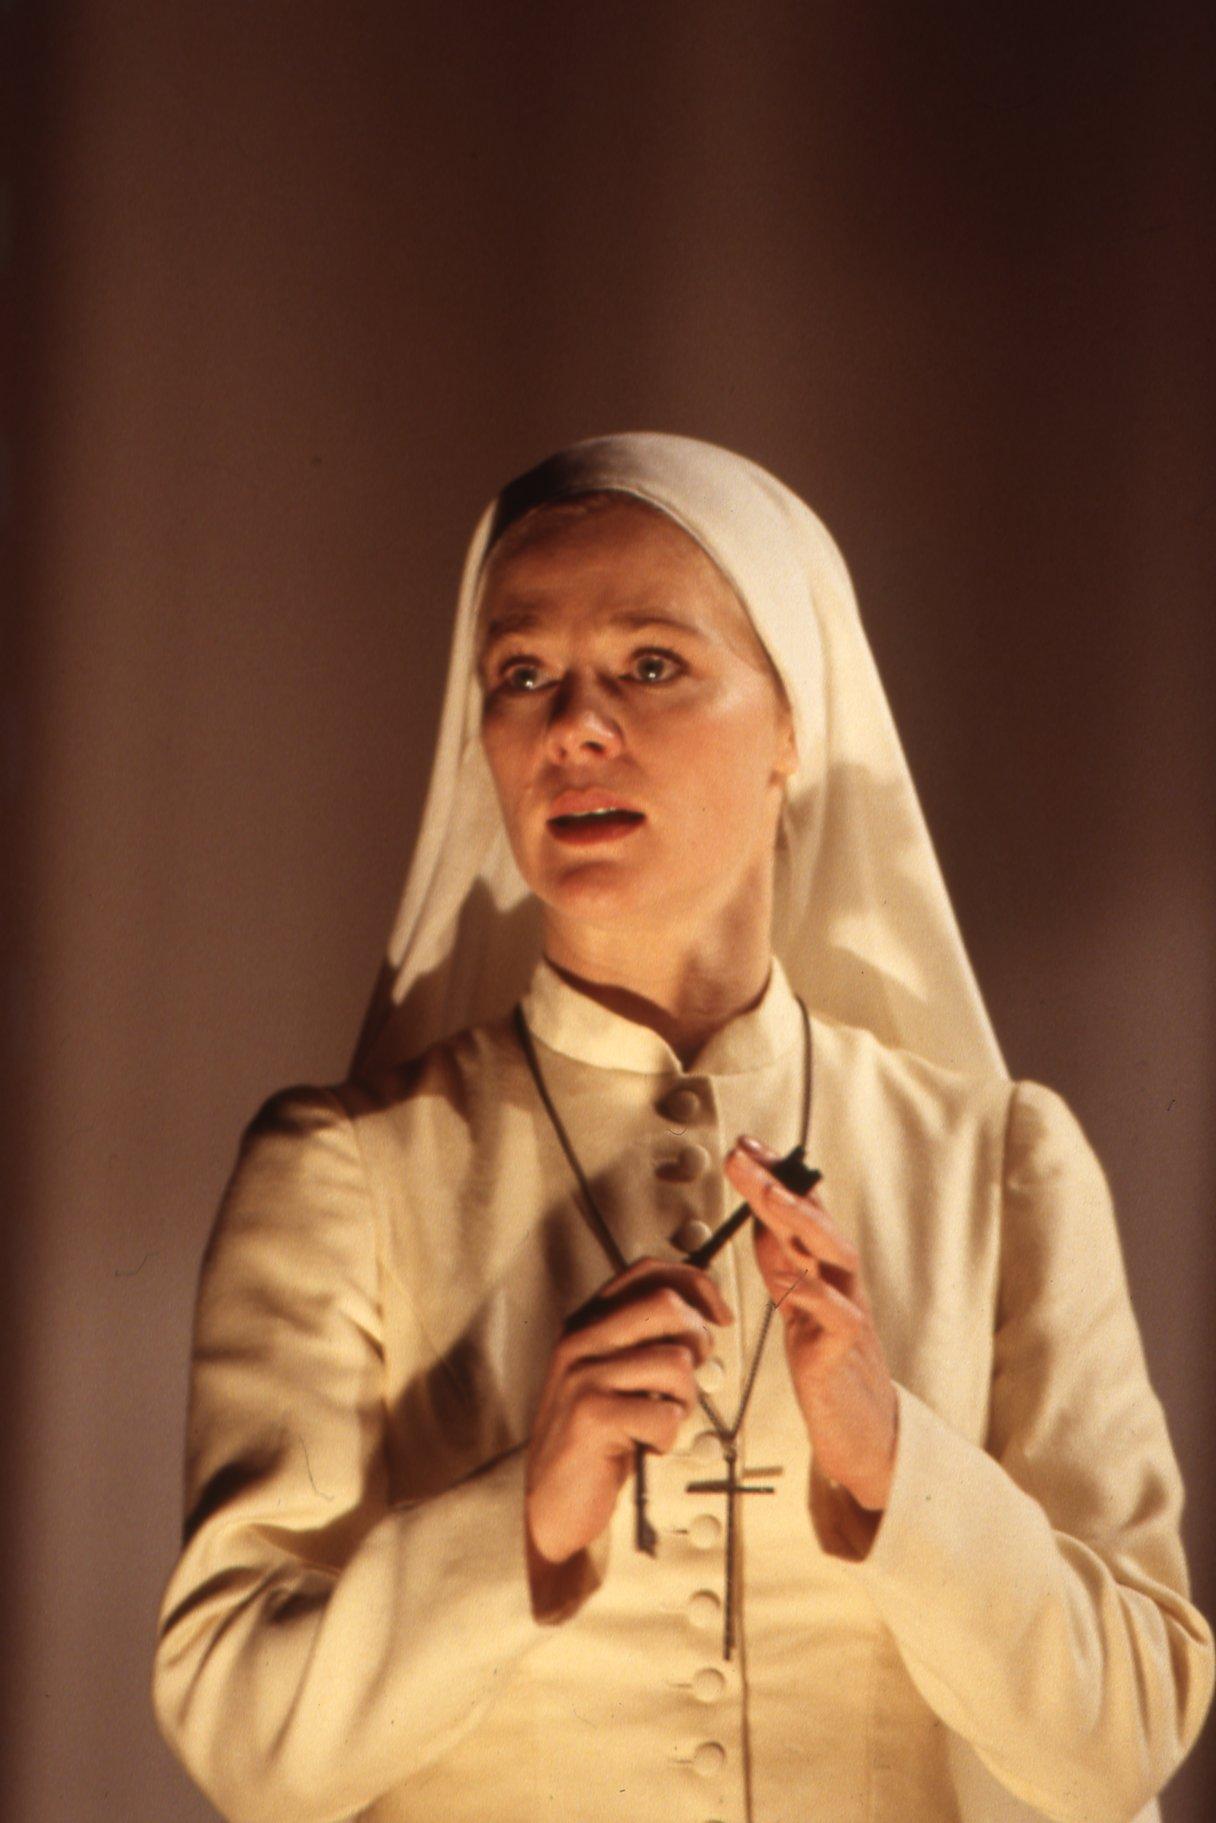 A nun in all white.